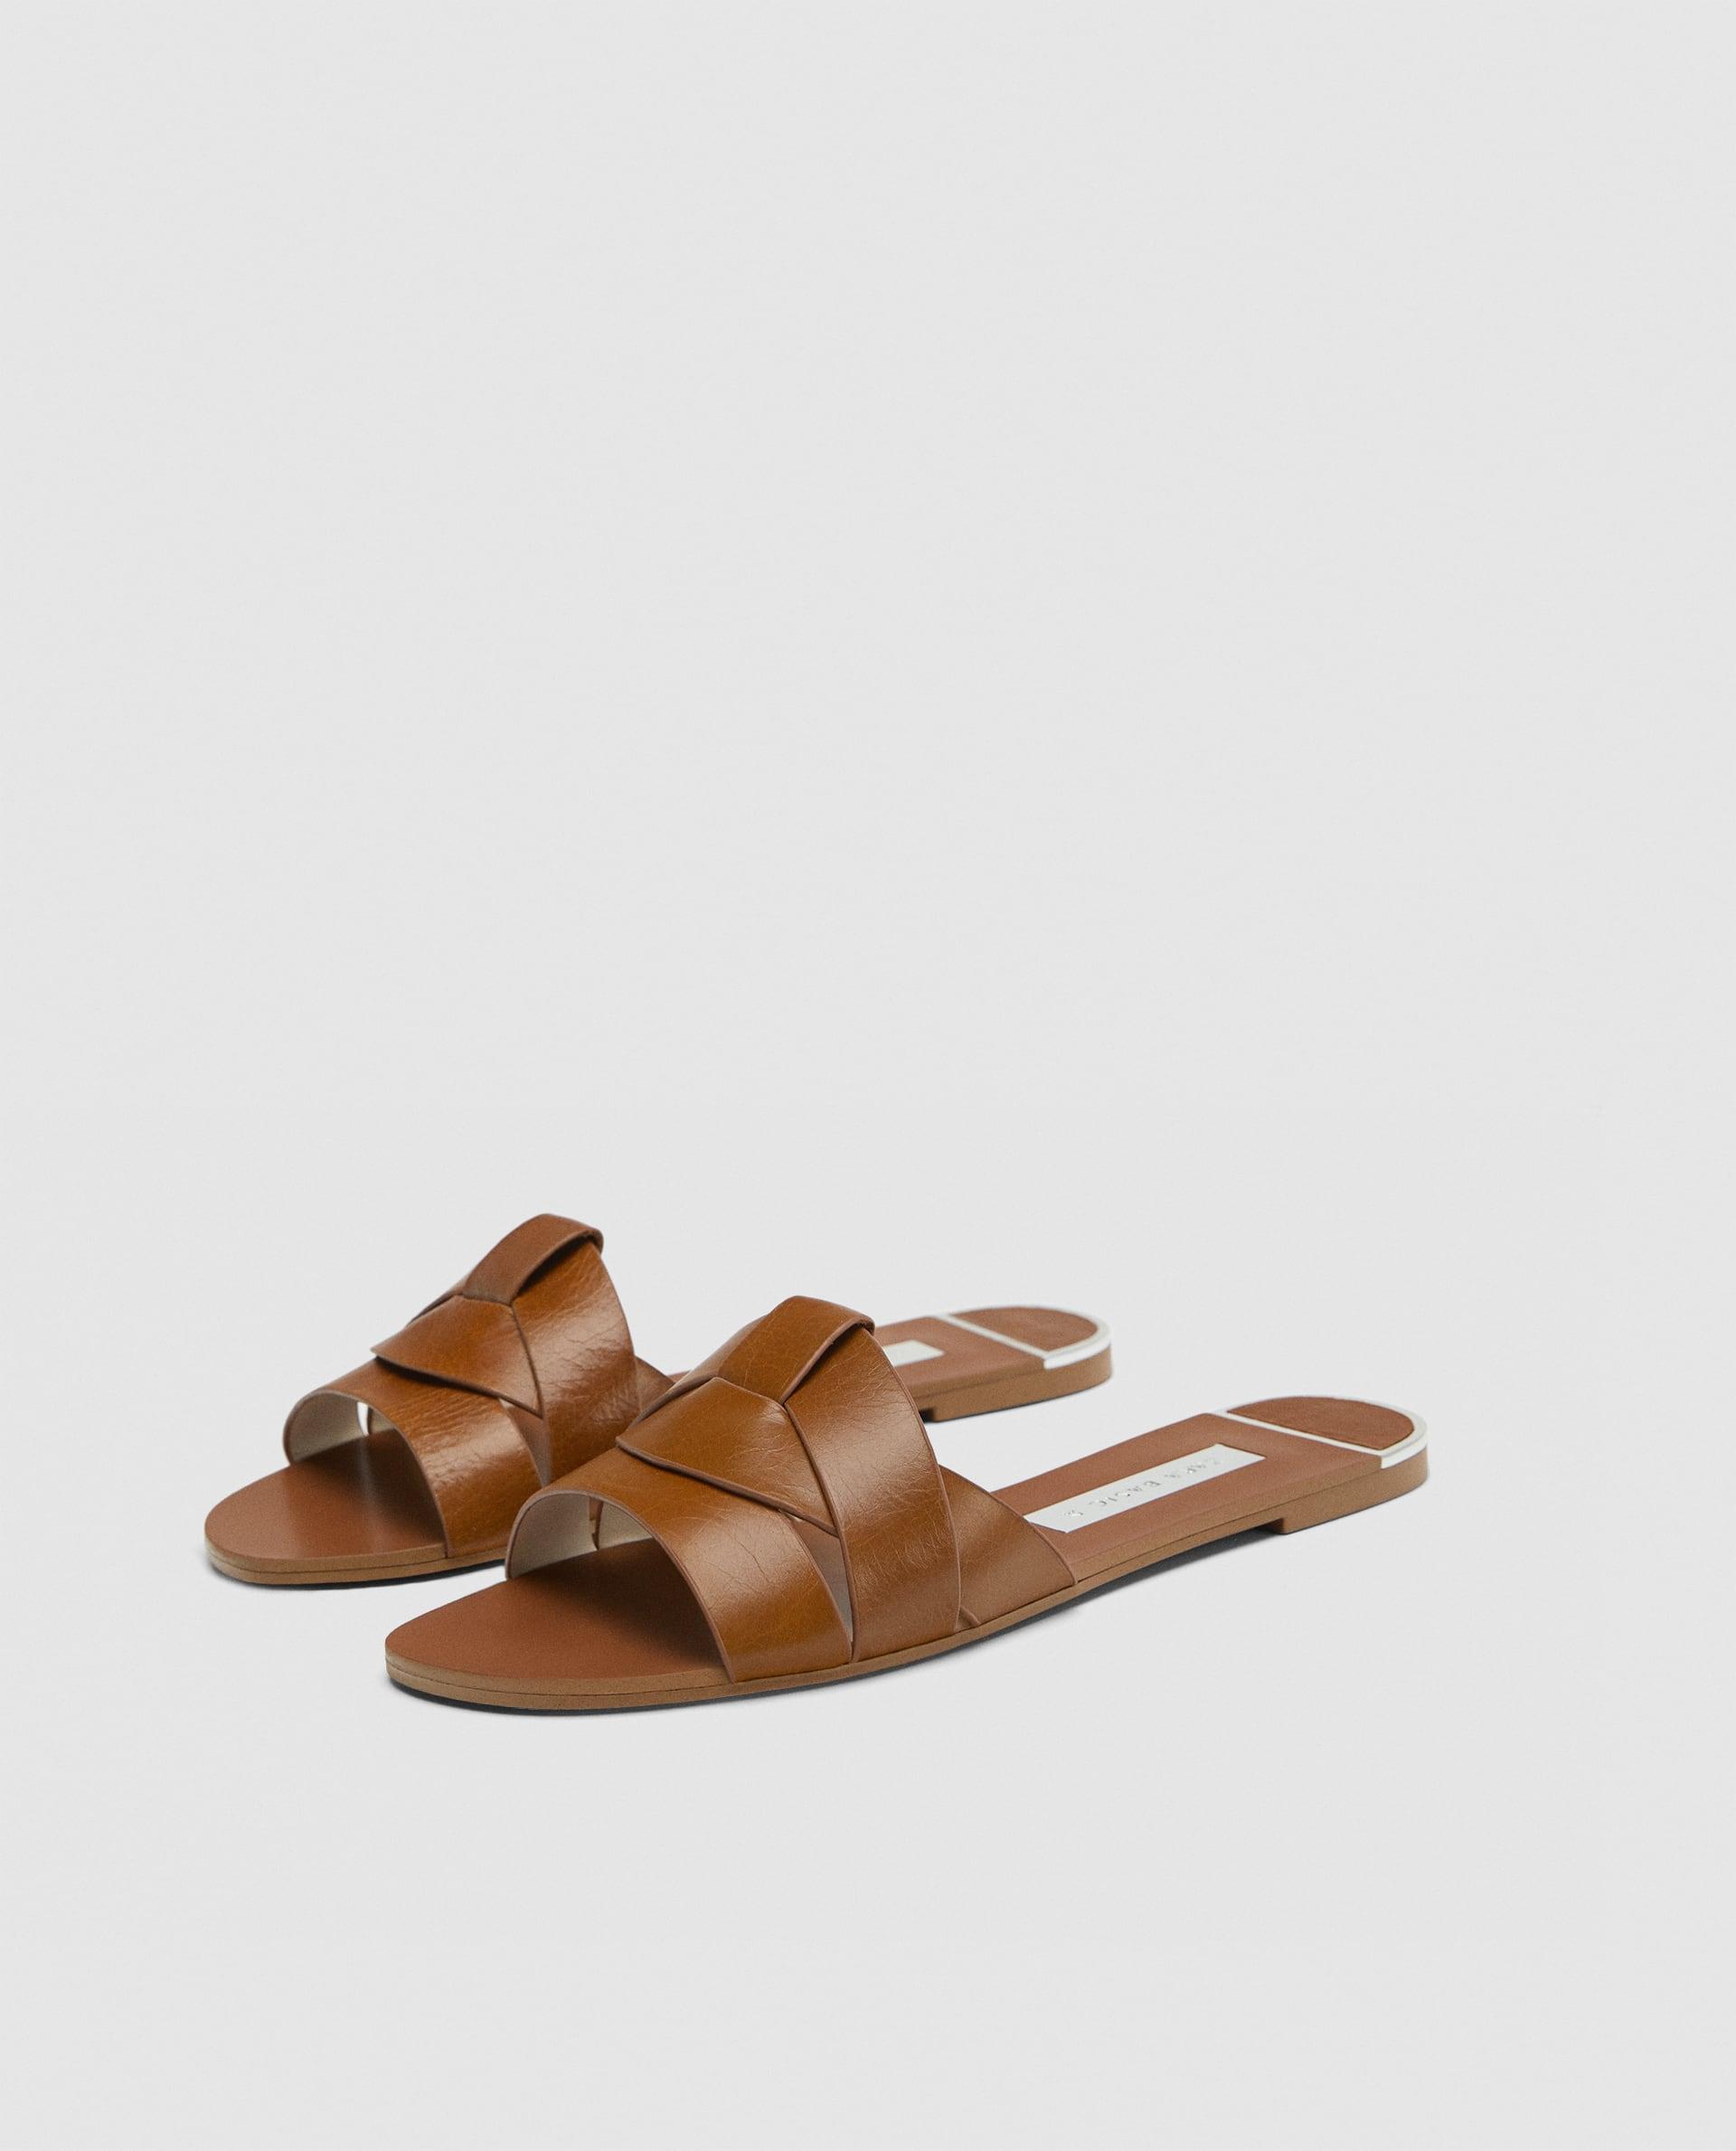 €30 You'll Summer Long Wearing Sandals The Be Xoebrdc Zara Mamasmeet All 2IEDWH9